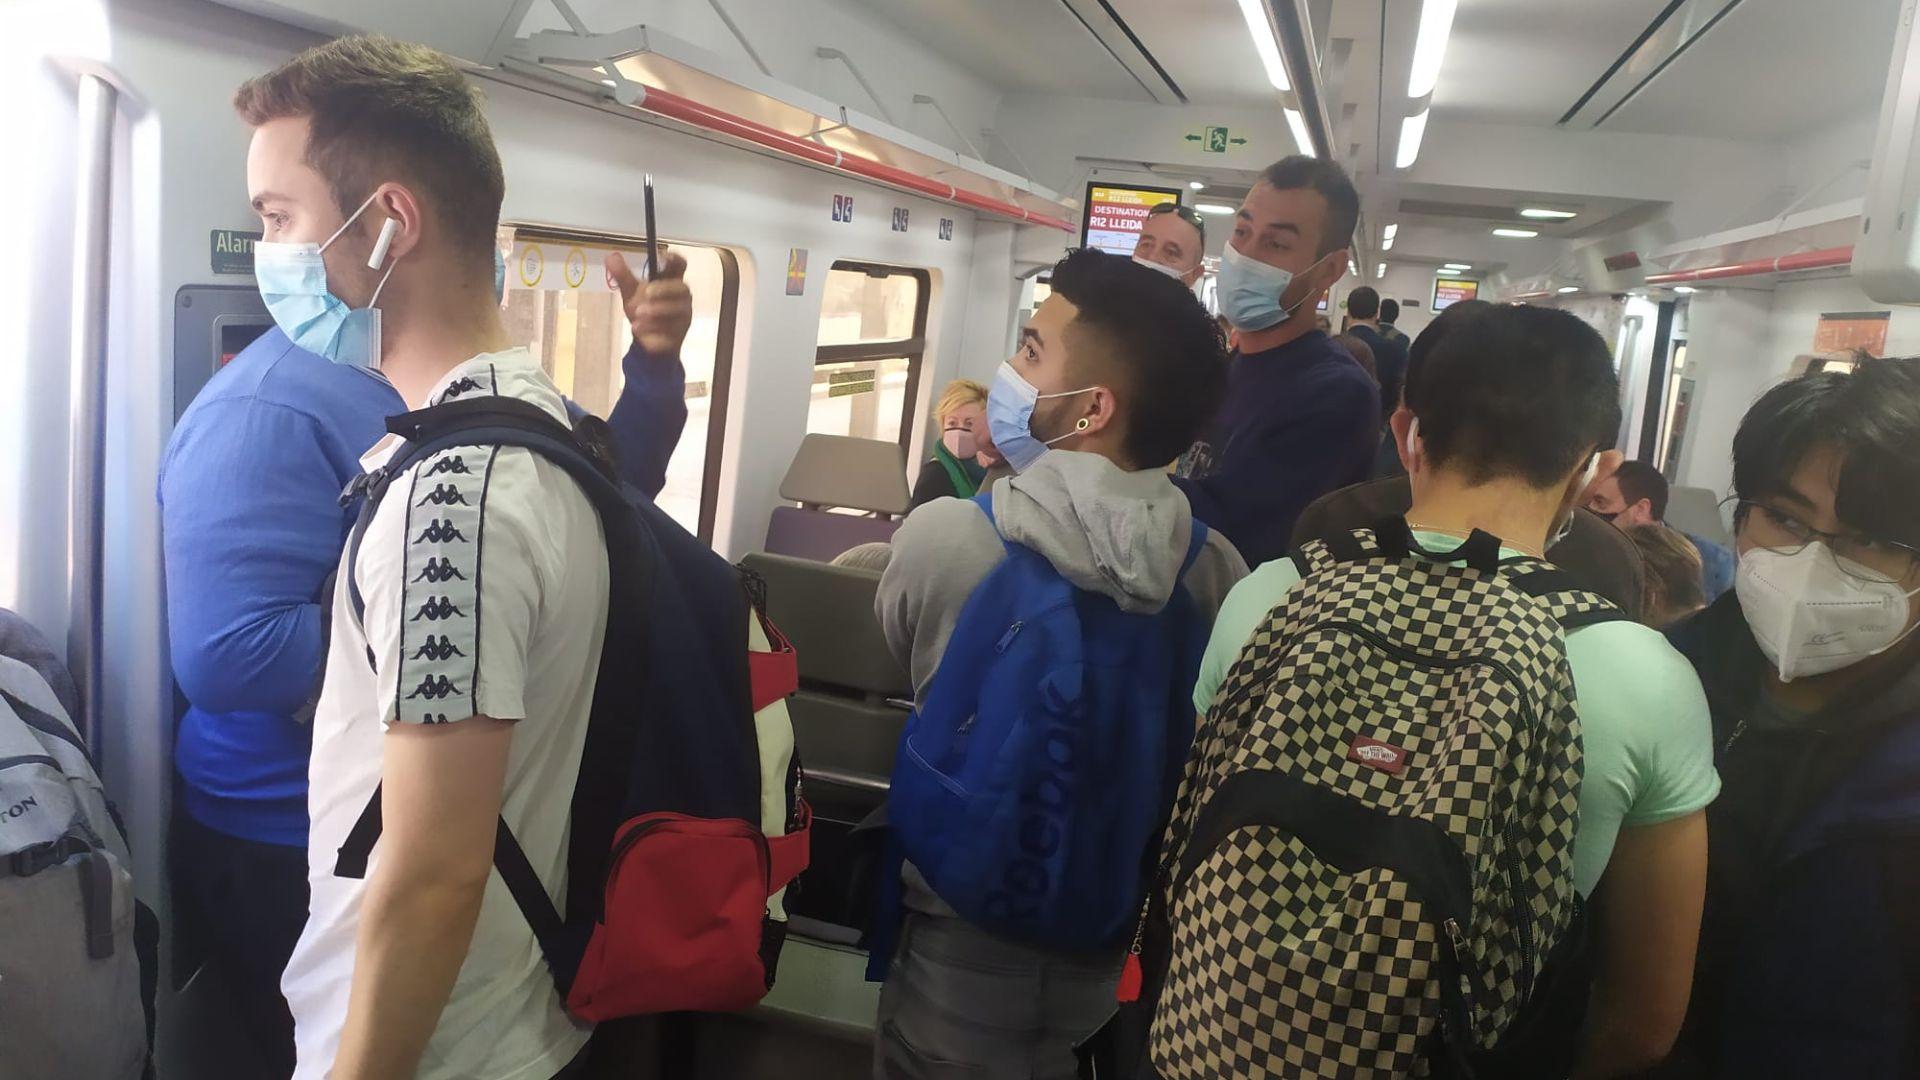 Interior tren ple gent